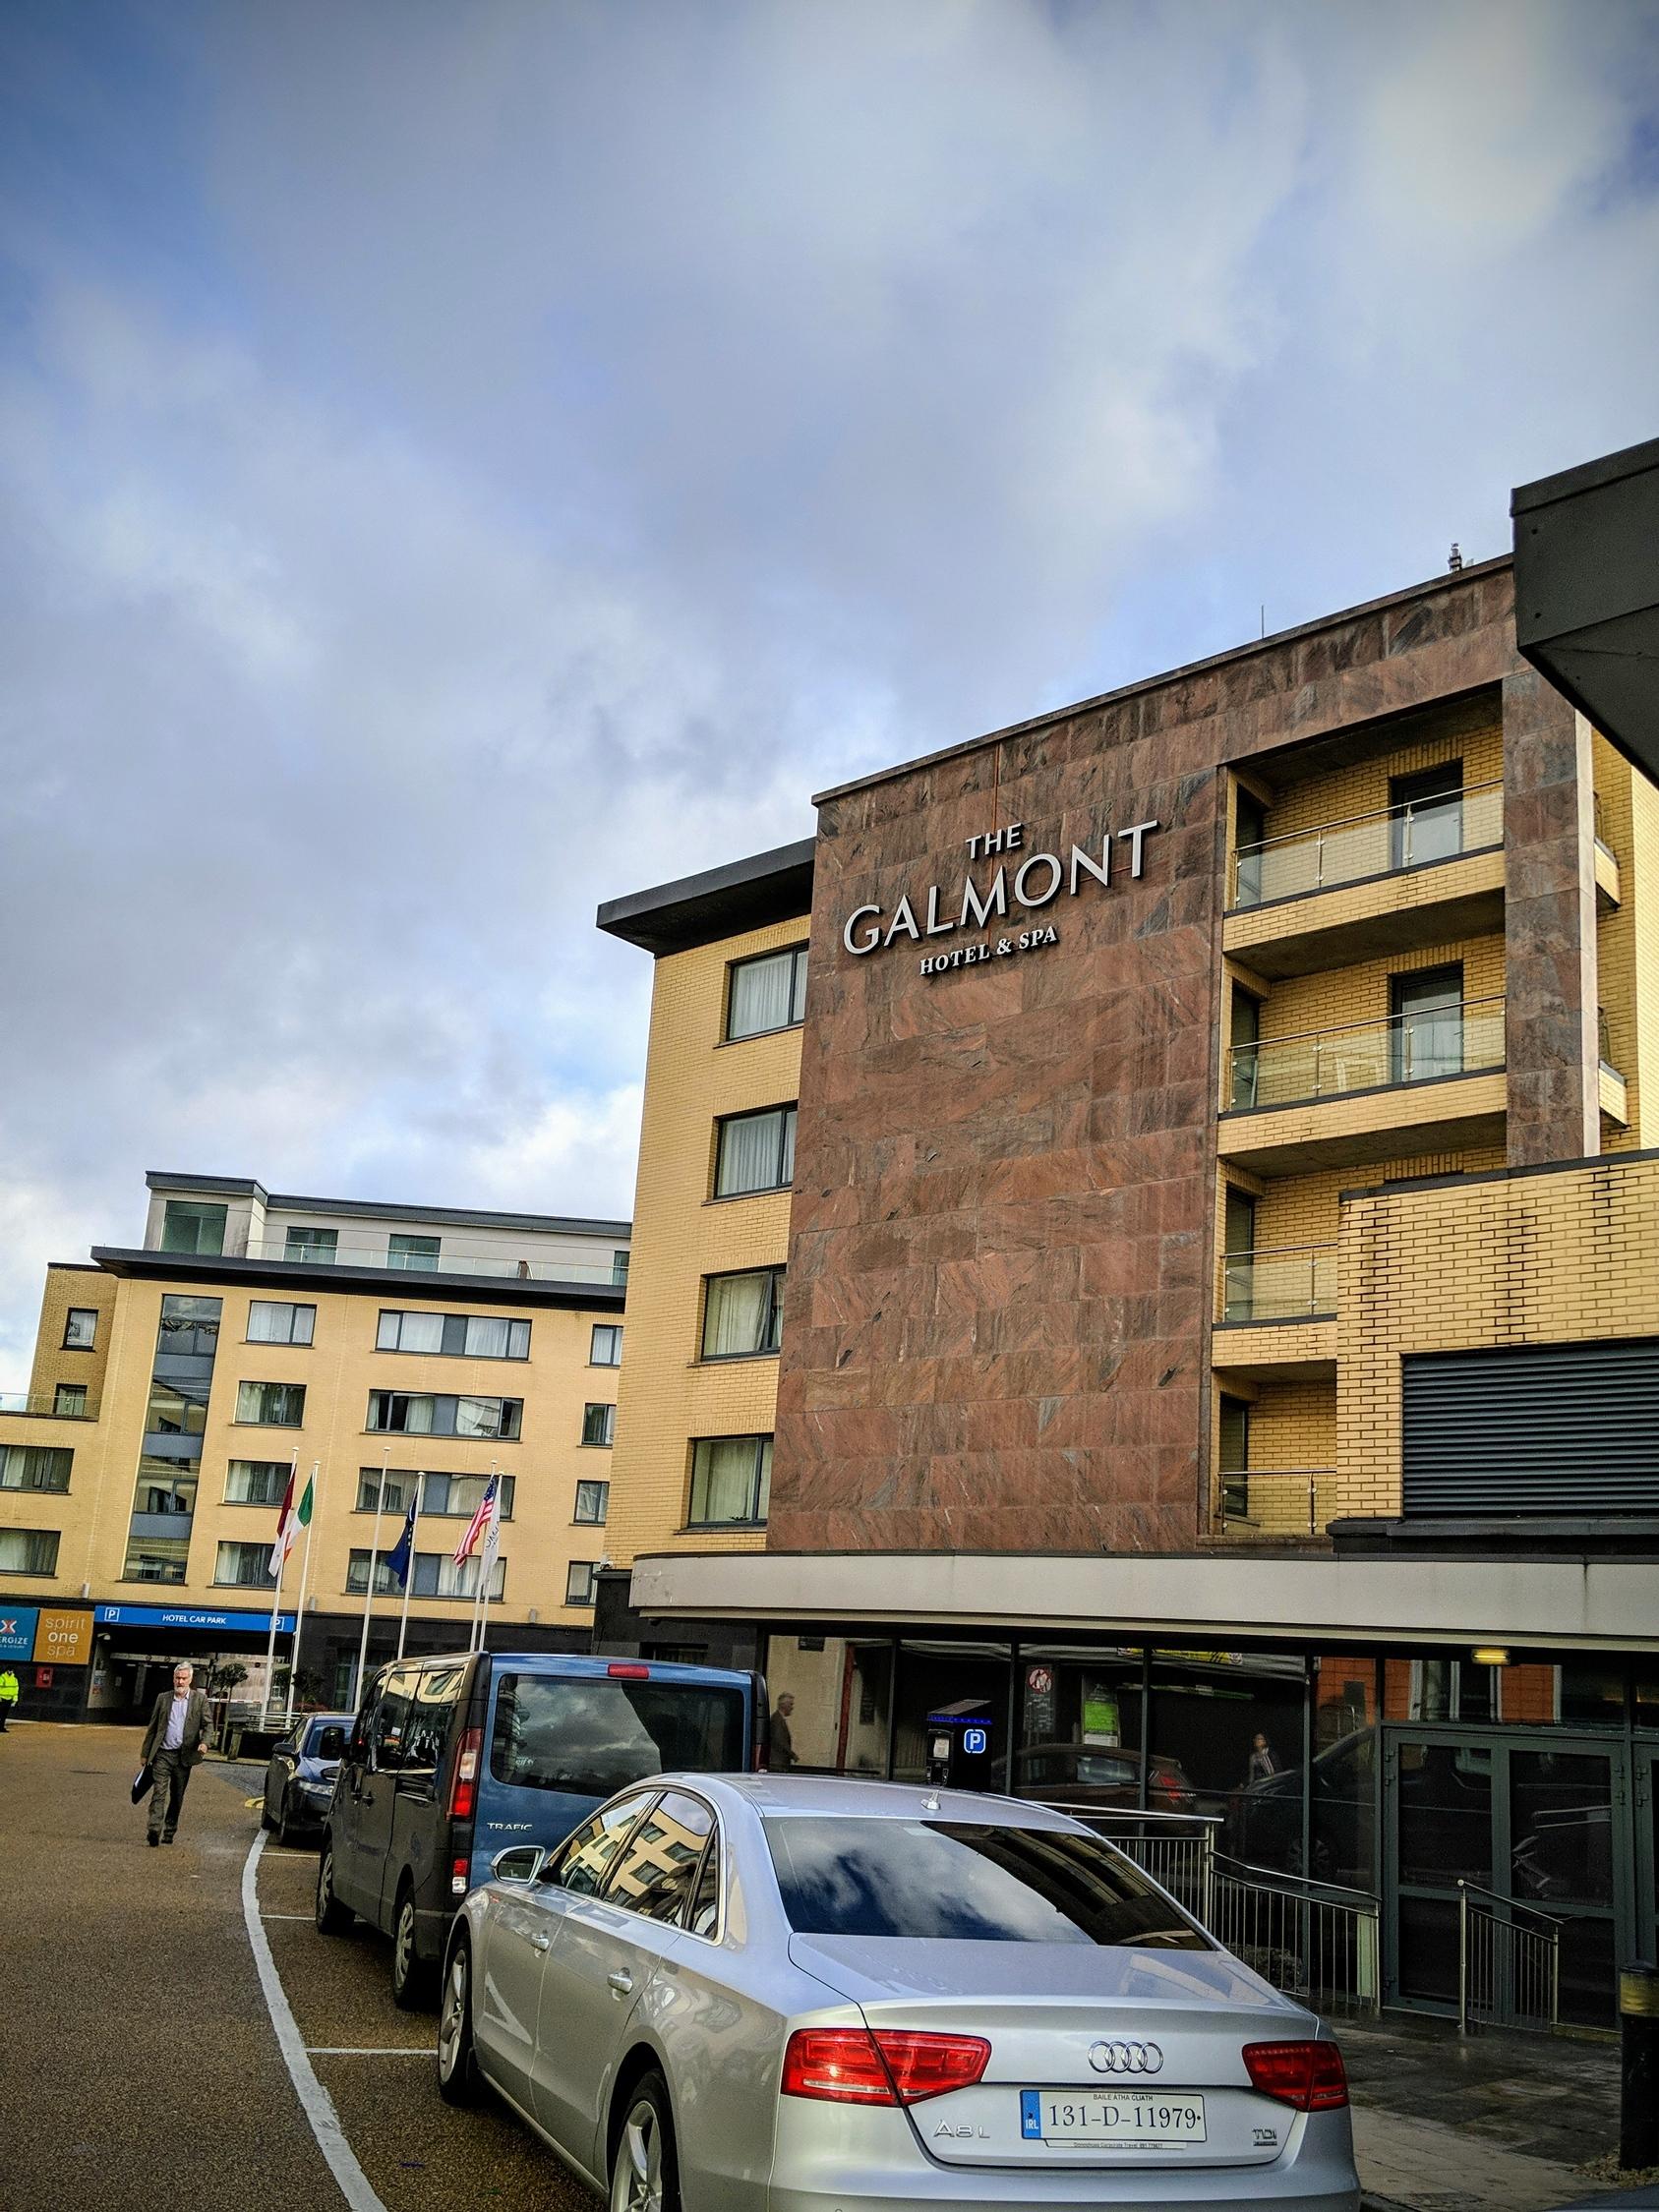 Galmont Hotel in Galway Ireland exterior.